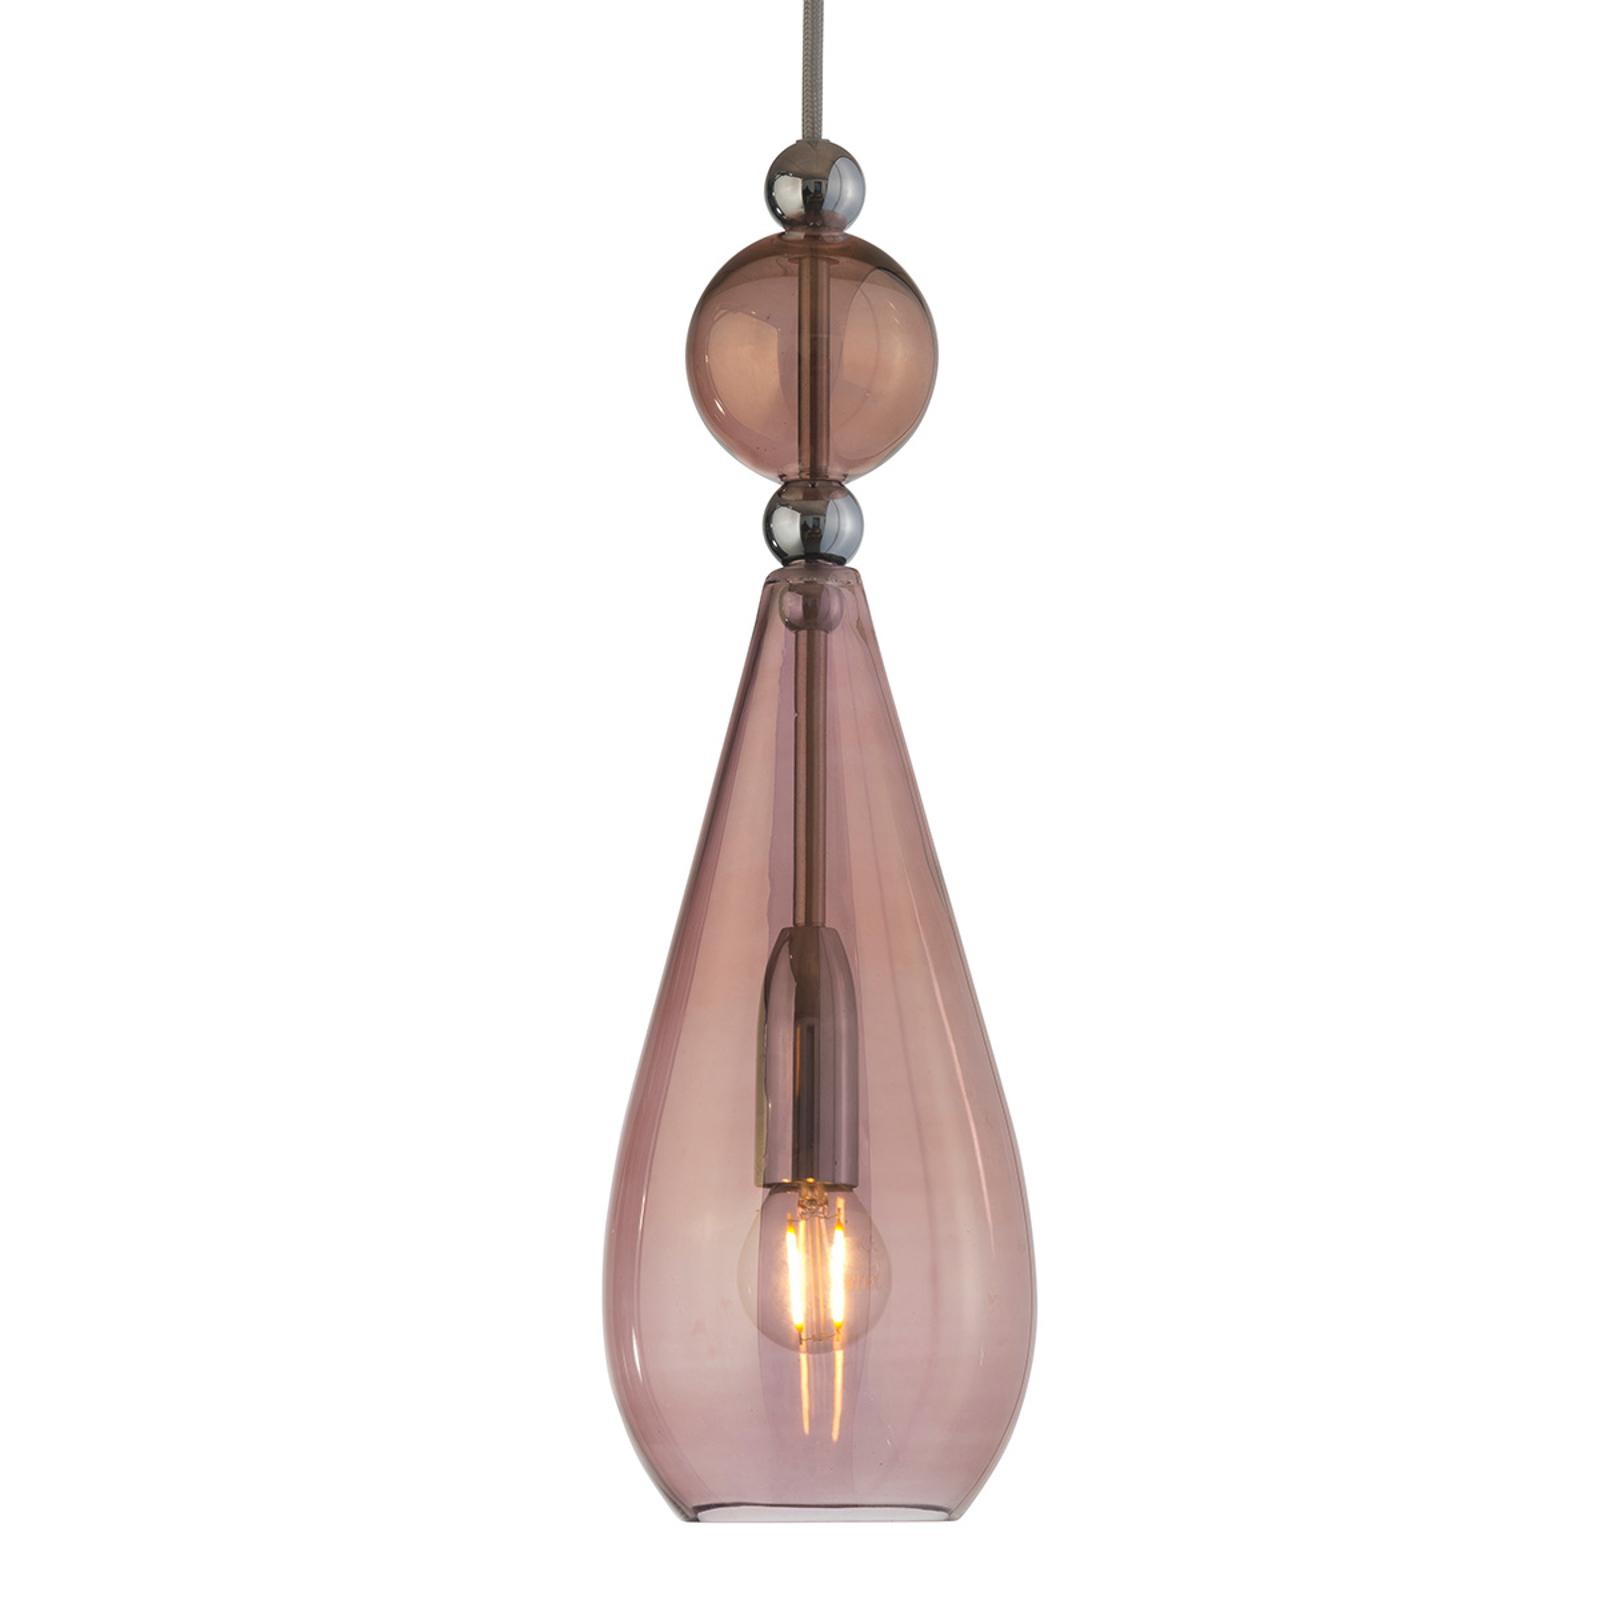 EBB & FLOW Smykke hanglamp zilver, bruin-rosé